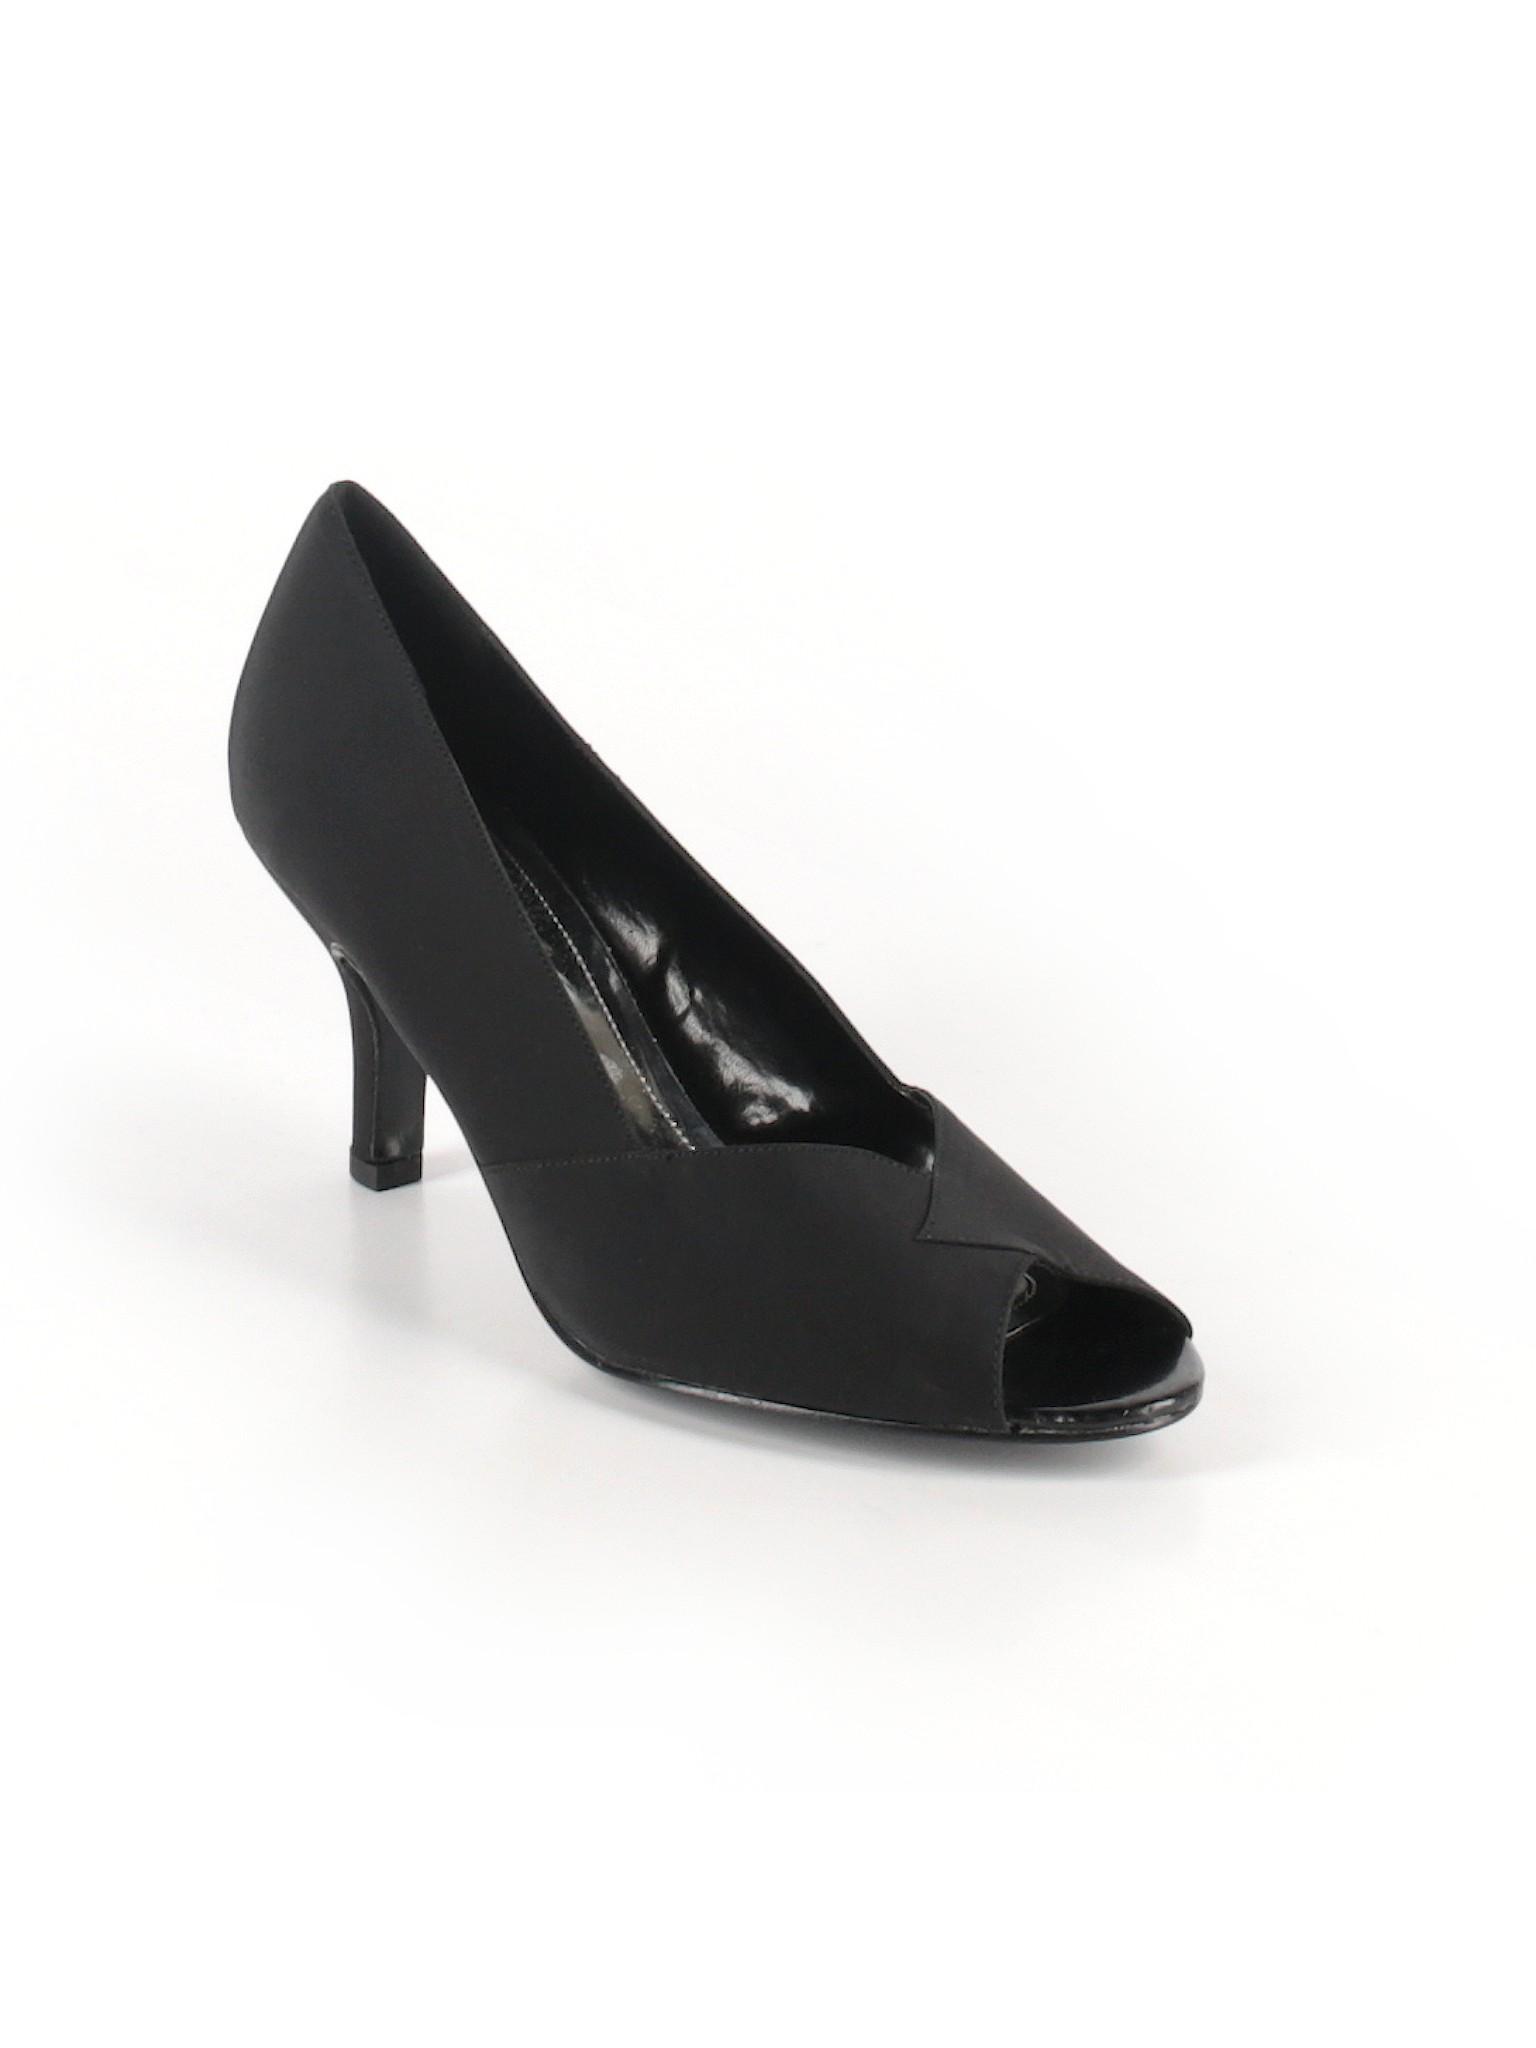 Easy Heels Boutique Boutique Street promotion promotion tw7qgqxX